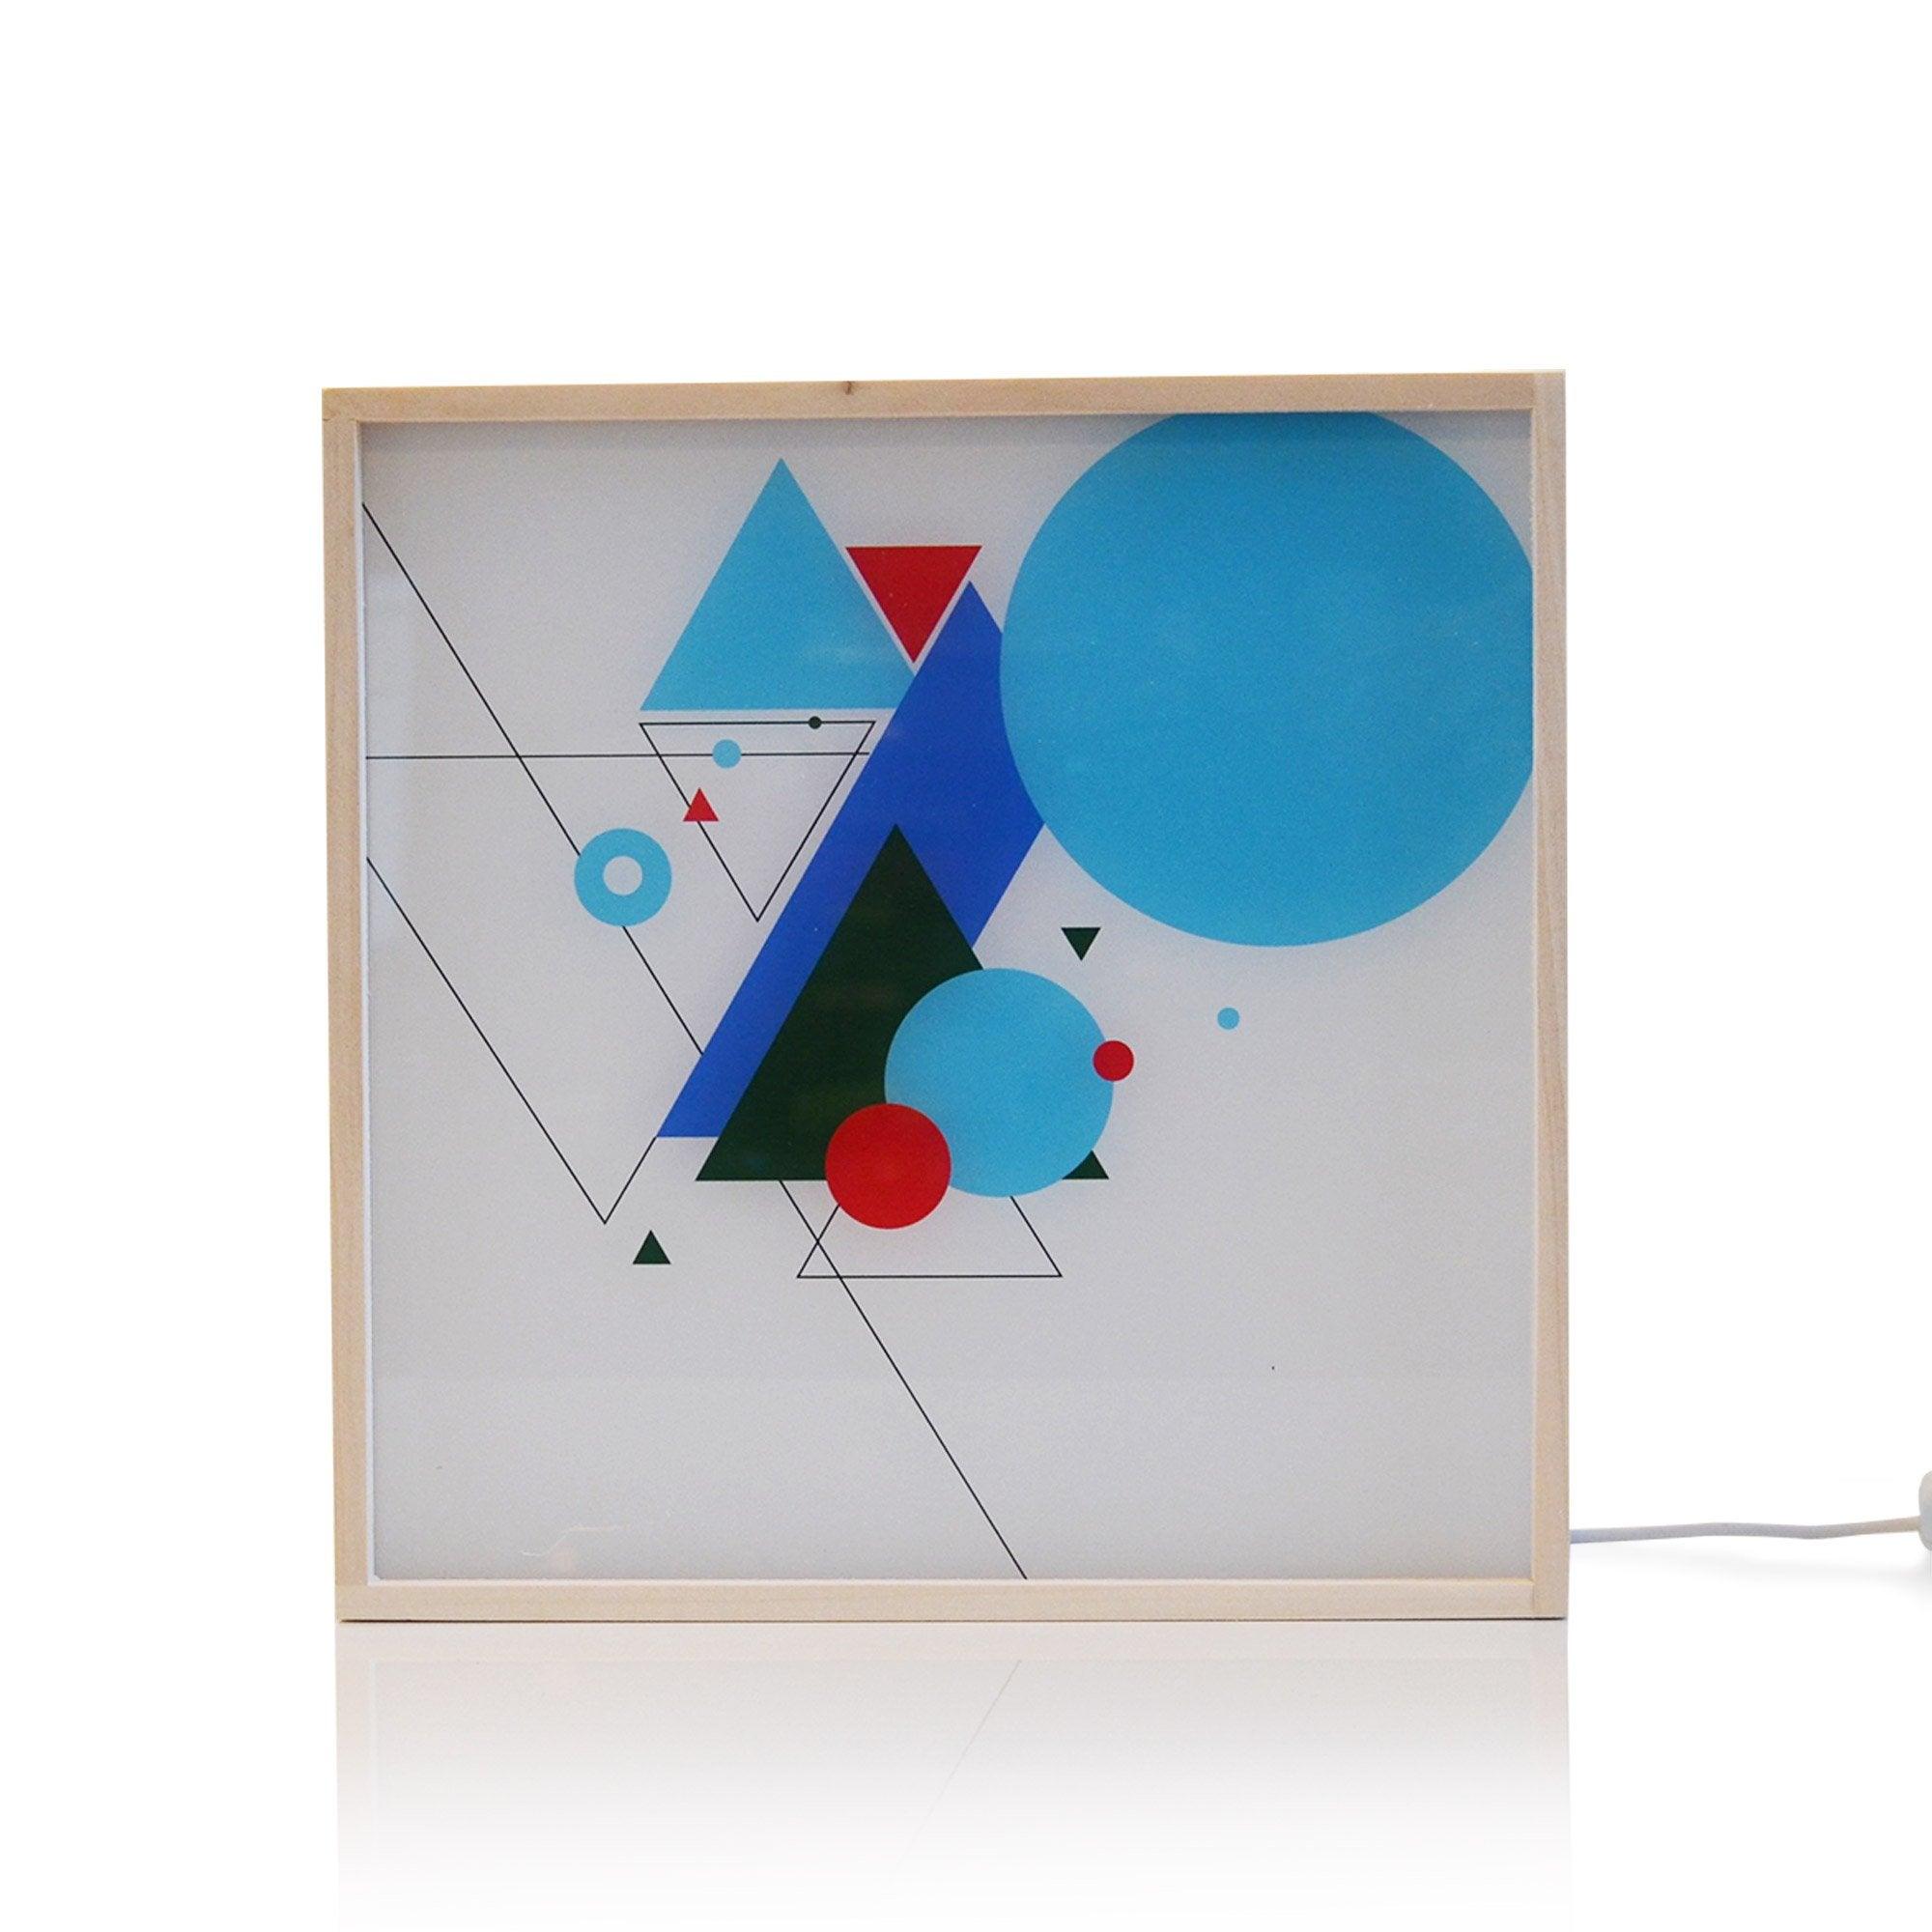 Light box, led intégrée Dada light, synthétique bleu, 9.6 W